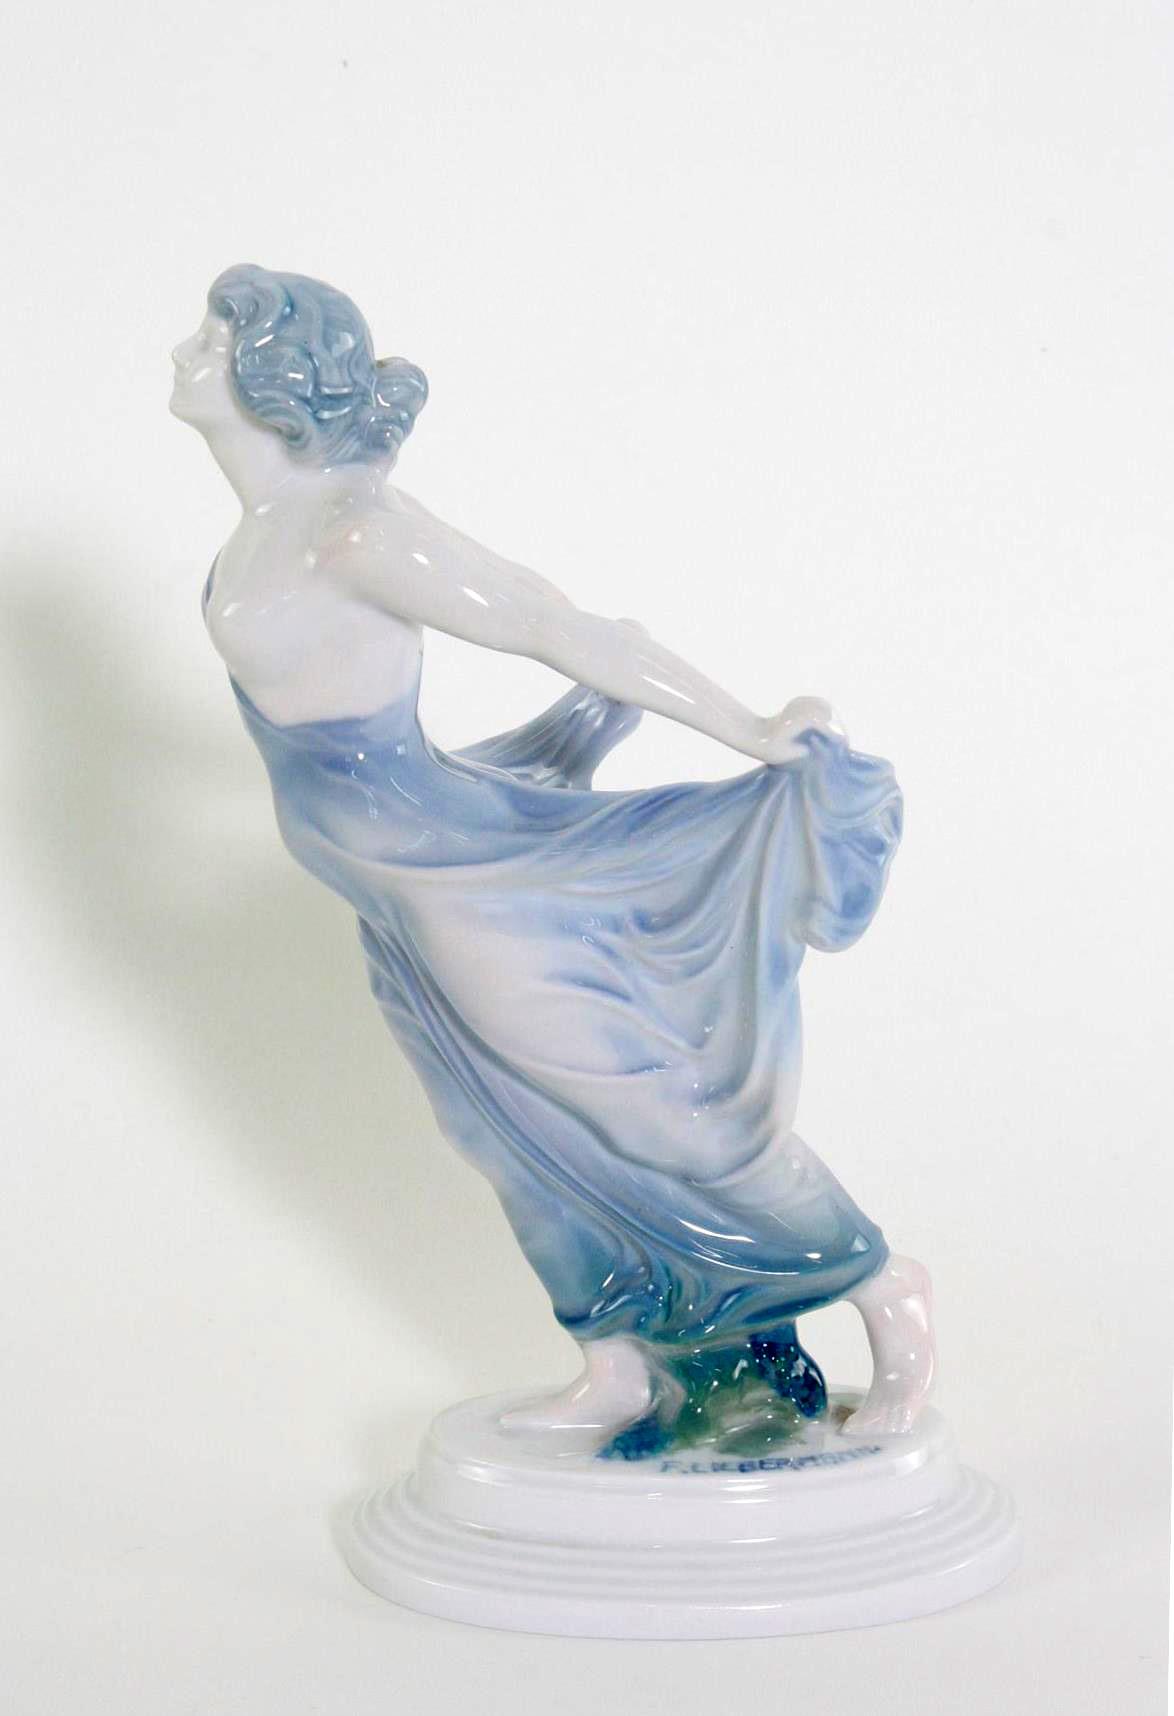 Porzellanskulptur, 'Tänzerin', Rosenthal, Kunst-Abteilung, 1920er Jahre